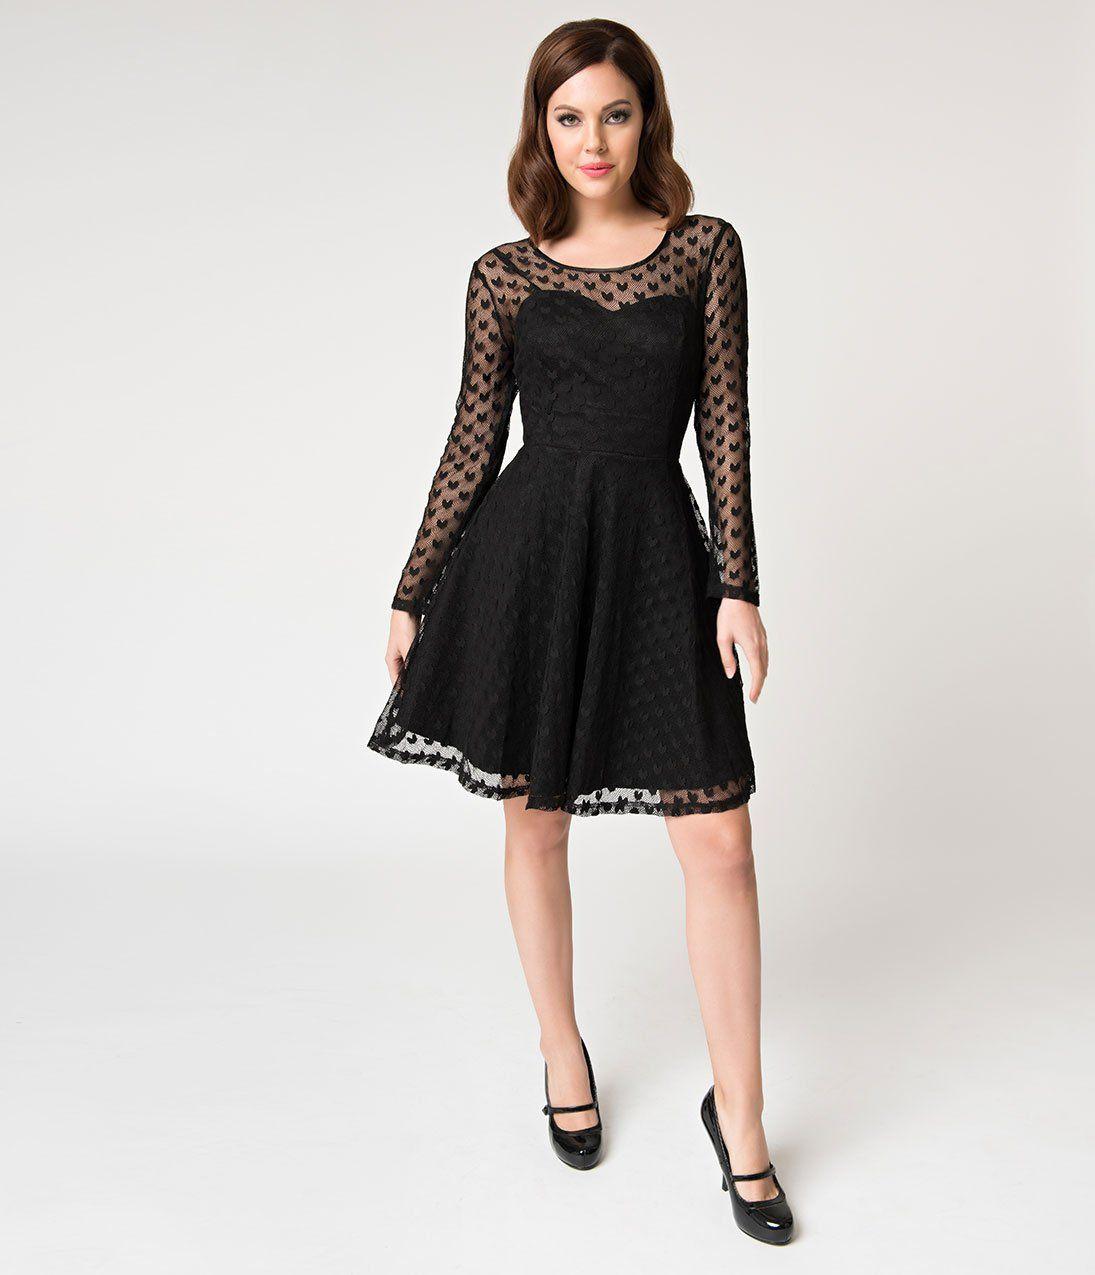 Black Mesh Heartcore Swiss Dotted Long Sleeved Fit Flare Dress Unique Vintage Fit Flare Dress Flare Dress Dresses [ 1275 x 1095 Pixel ]